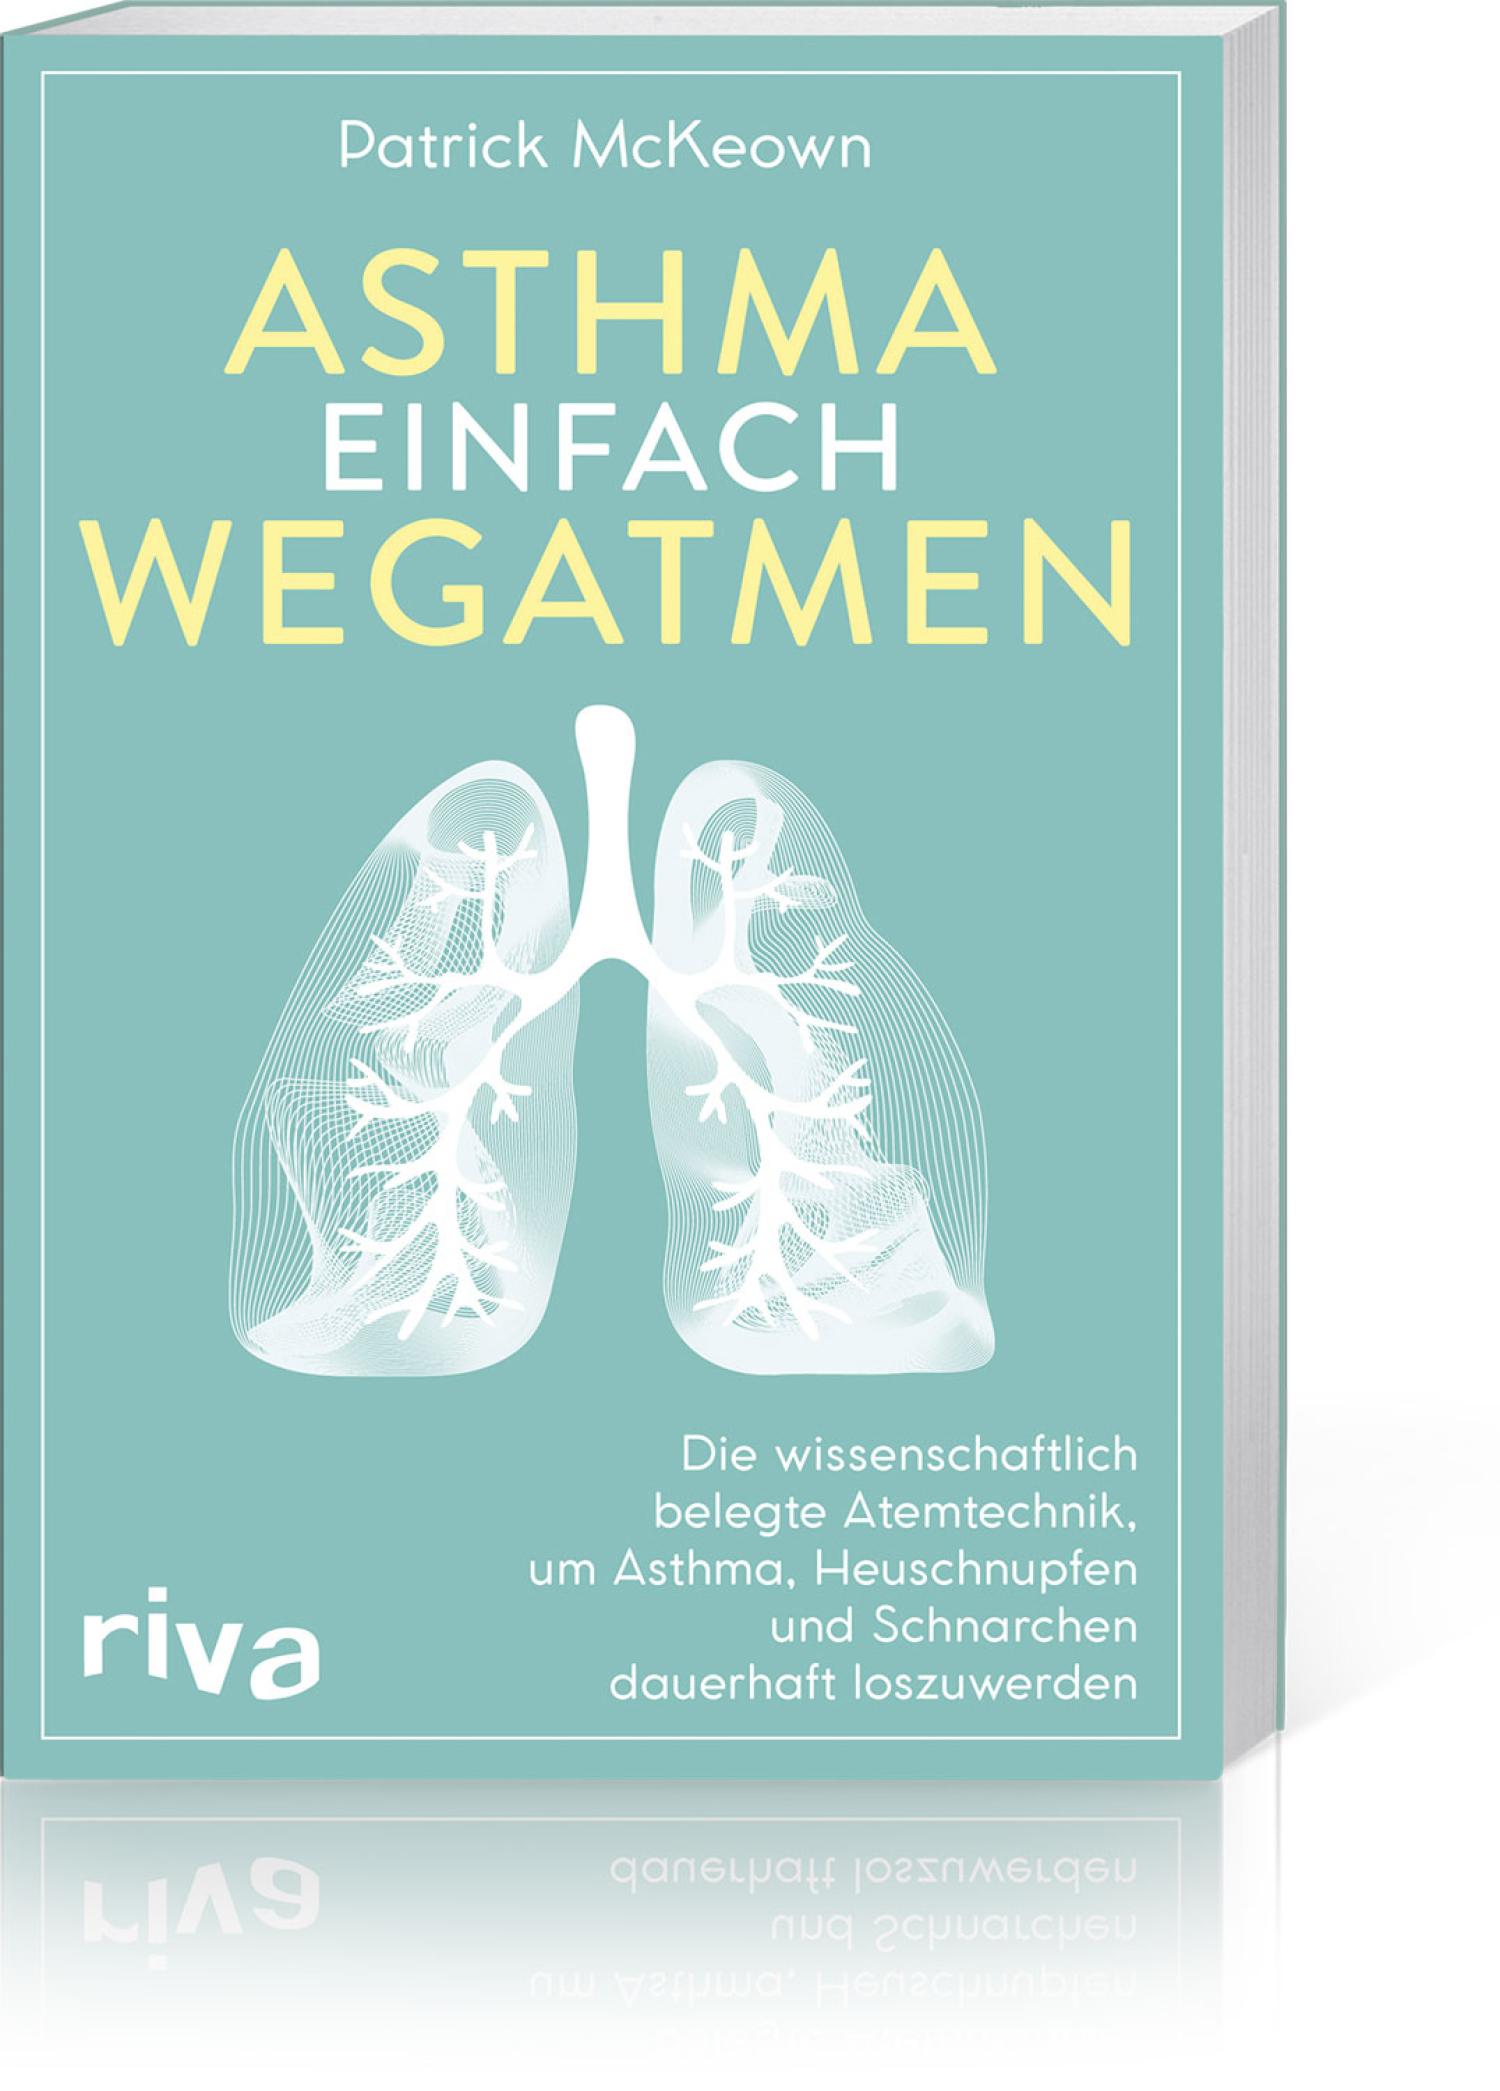 Asthma einfach wegatmen, Produktbild 1